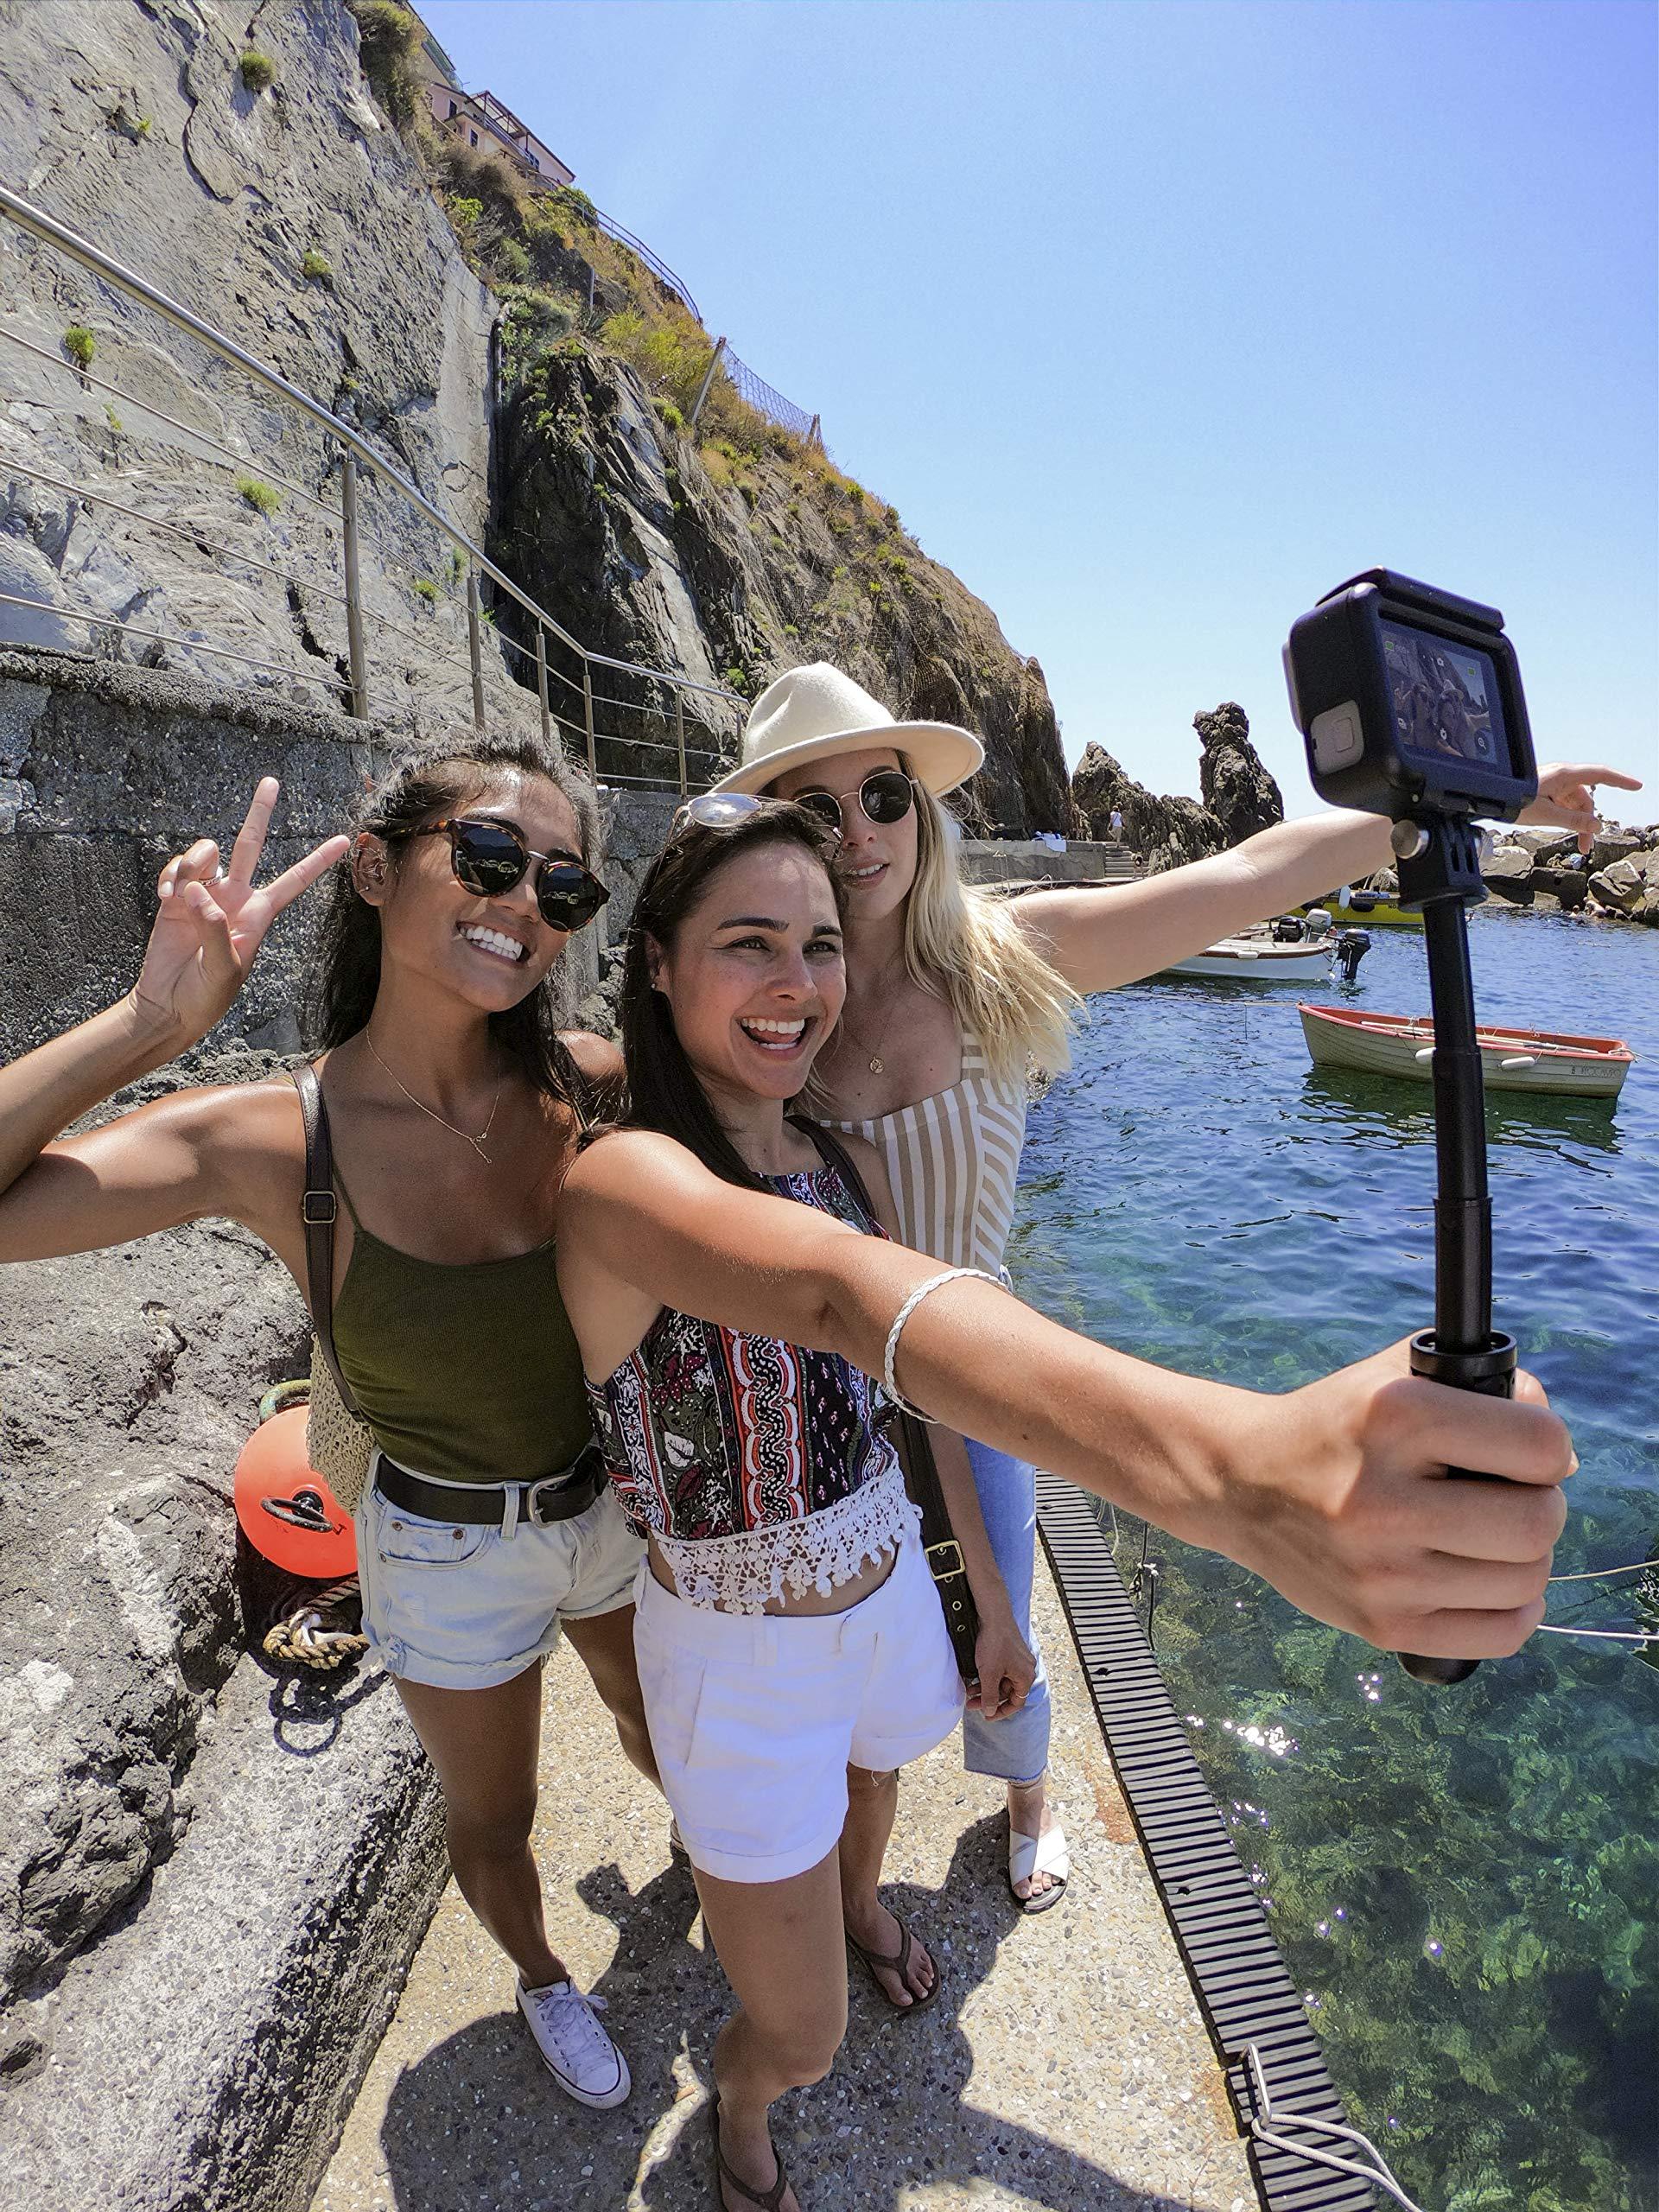 GoPro HERO7 White - Waterproof Digital Action Camera with Sleeve Plus Lanyard 8